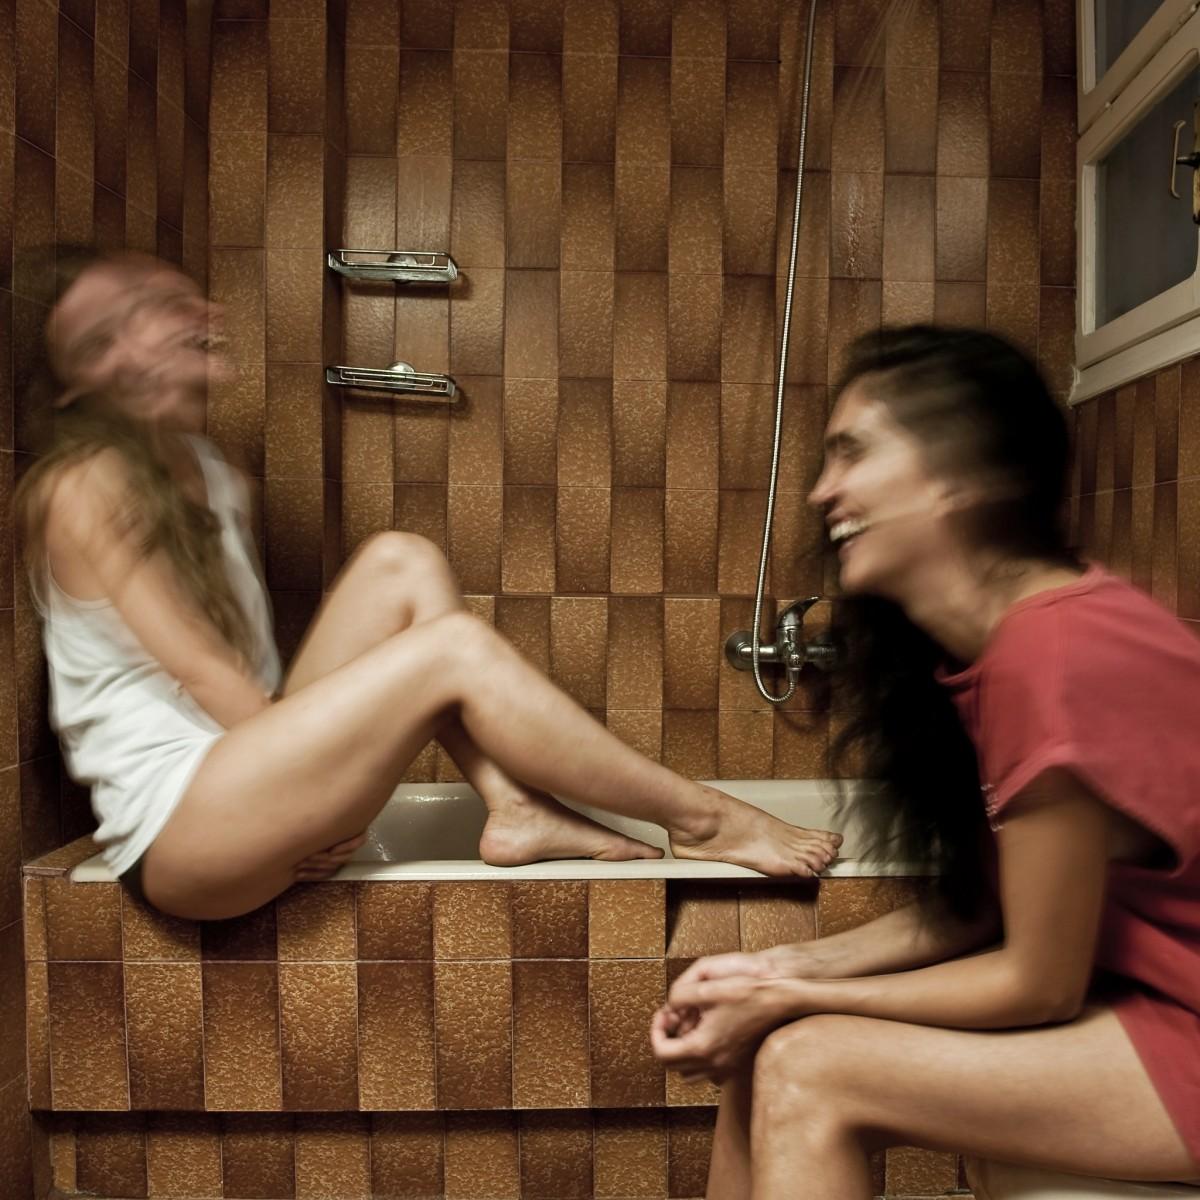 """10 must see παραστάσεις"" από τη Στέλλα Χαραμή στο monopoli.gr | Ο Κωστής Παπαγιώργης είχε γράψει πως η «Λούλα», το μυθιστόρημα του Βαγγέλη Ραπτόπουλου είναι ικανό για «μια γενιά να δείξει τα δόντια της». Αυτή η γενιά των 90s, που χαρίστηκε (σχεδόν εξ ολοκλήρου) στην υποκουλτούρα του life style και της αστραφτερής επιφάνειας καθρεφτίζεται στο πρόσωπο μιας νεαρής φοιτήτριας Φιλοσοφίας που αναζητά μάταια κι εμμονικά την ηδονή στον έρωτα. Η ομάδα των Elephas Tilensis, ο Δημήτρης Αγαρτζίδης και η Δέσποινα Αναστάσογλου – δημιουργοί της «Περσινής αρραβωνιαστικιάς» – καταπιάνονται με την πολυσυζητημένη πολιτική πορνογραφία του 1997 μοιράζοντας τους δυο ρόλους στις Ανθή Ευστρατιάδου και Βίκυ Κατσίκα.   Πηγή:www.monopoli.gr"